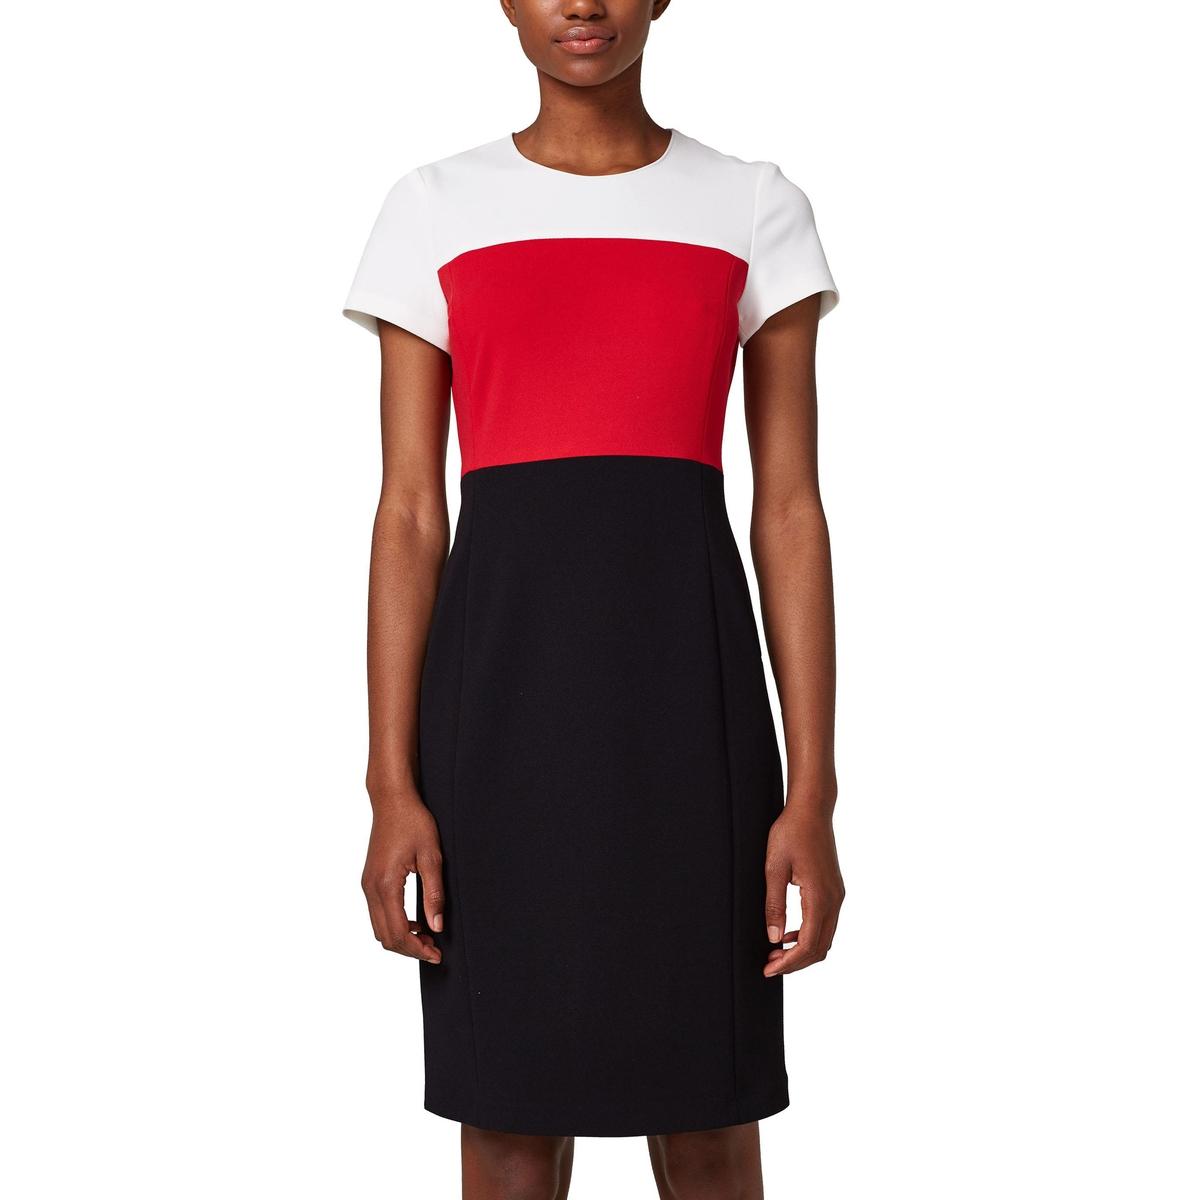 Vestido direito tricolor, mangas curtas